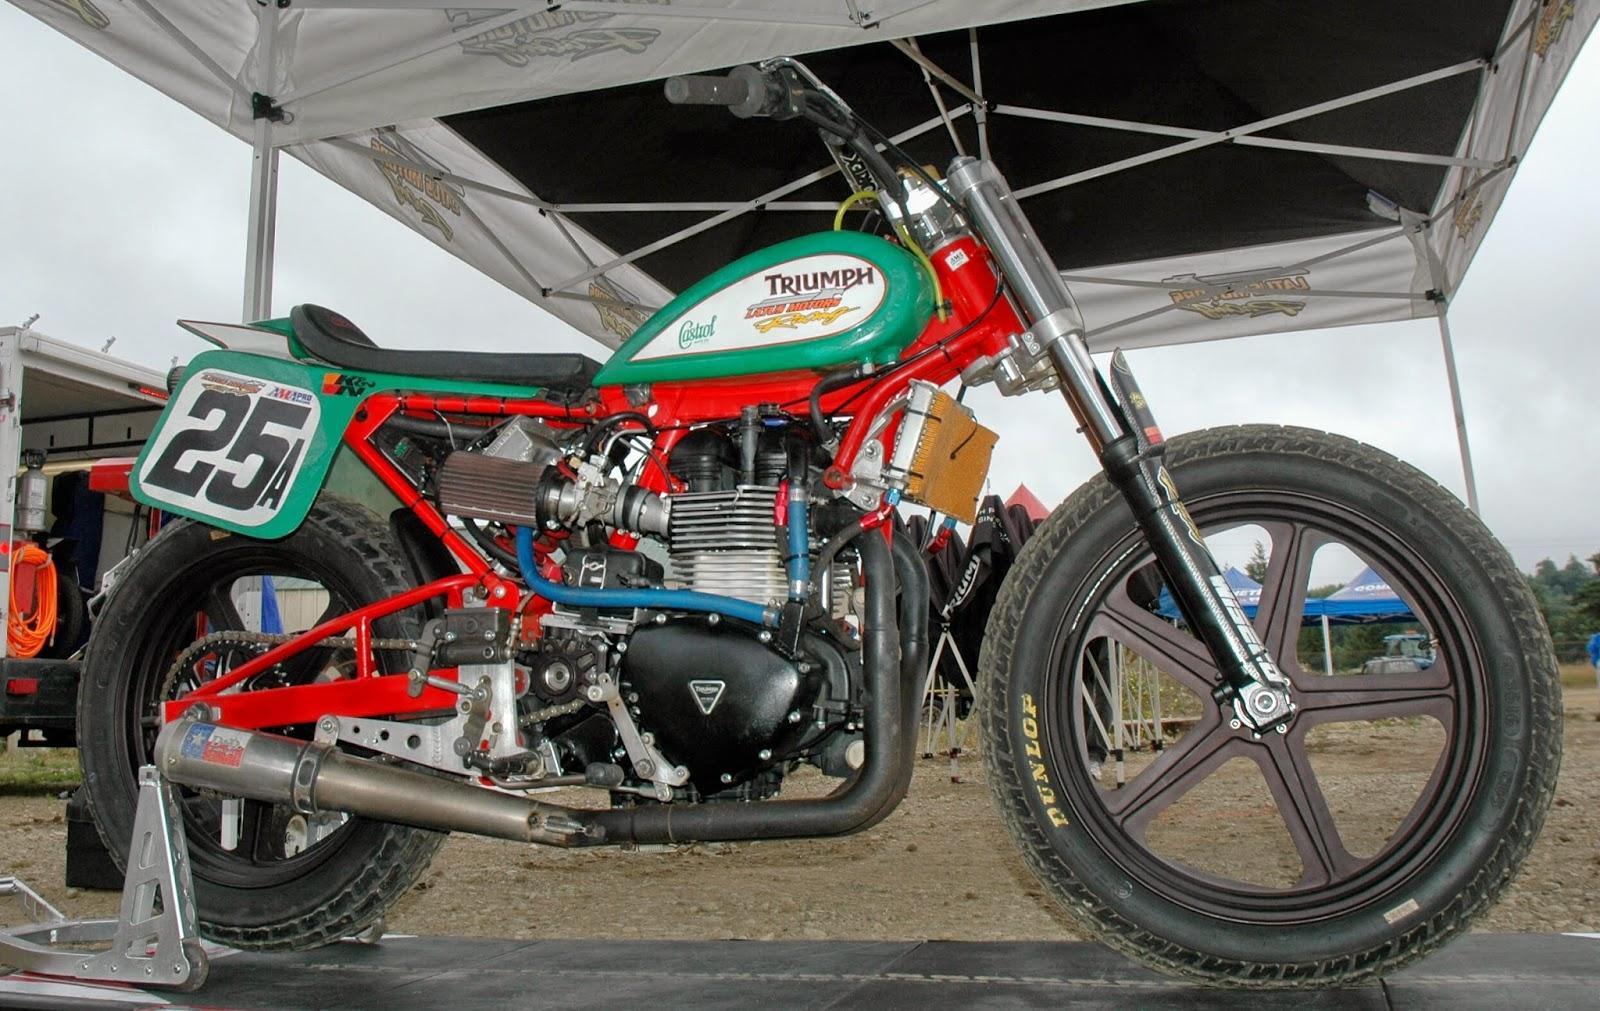 Poppa Wheelie Shayna Texter 25a Latus Motors Triumph